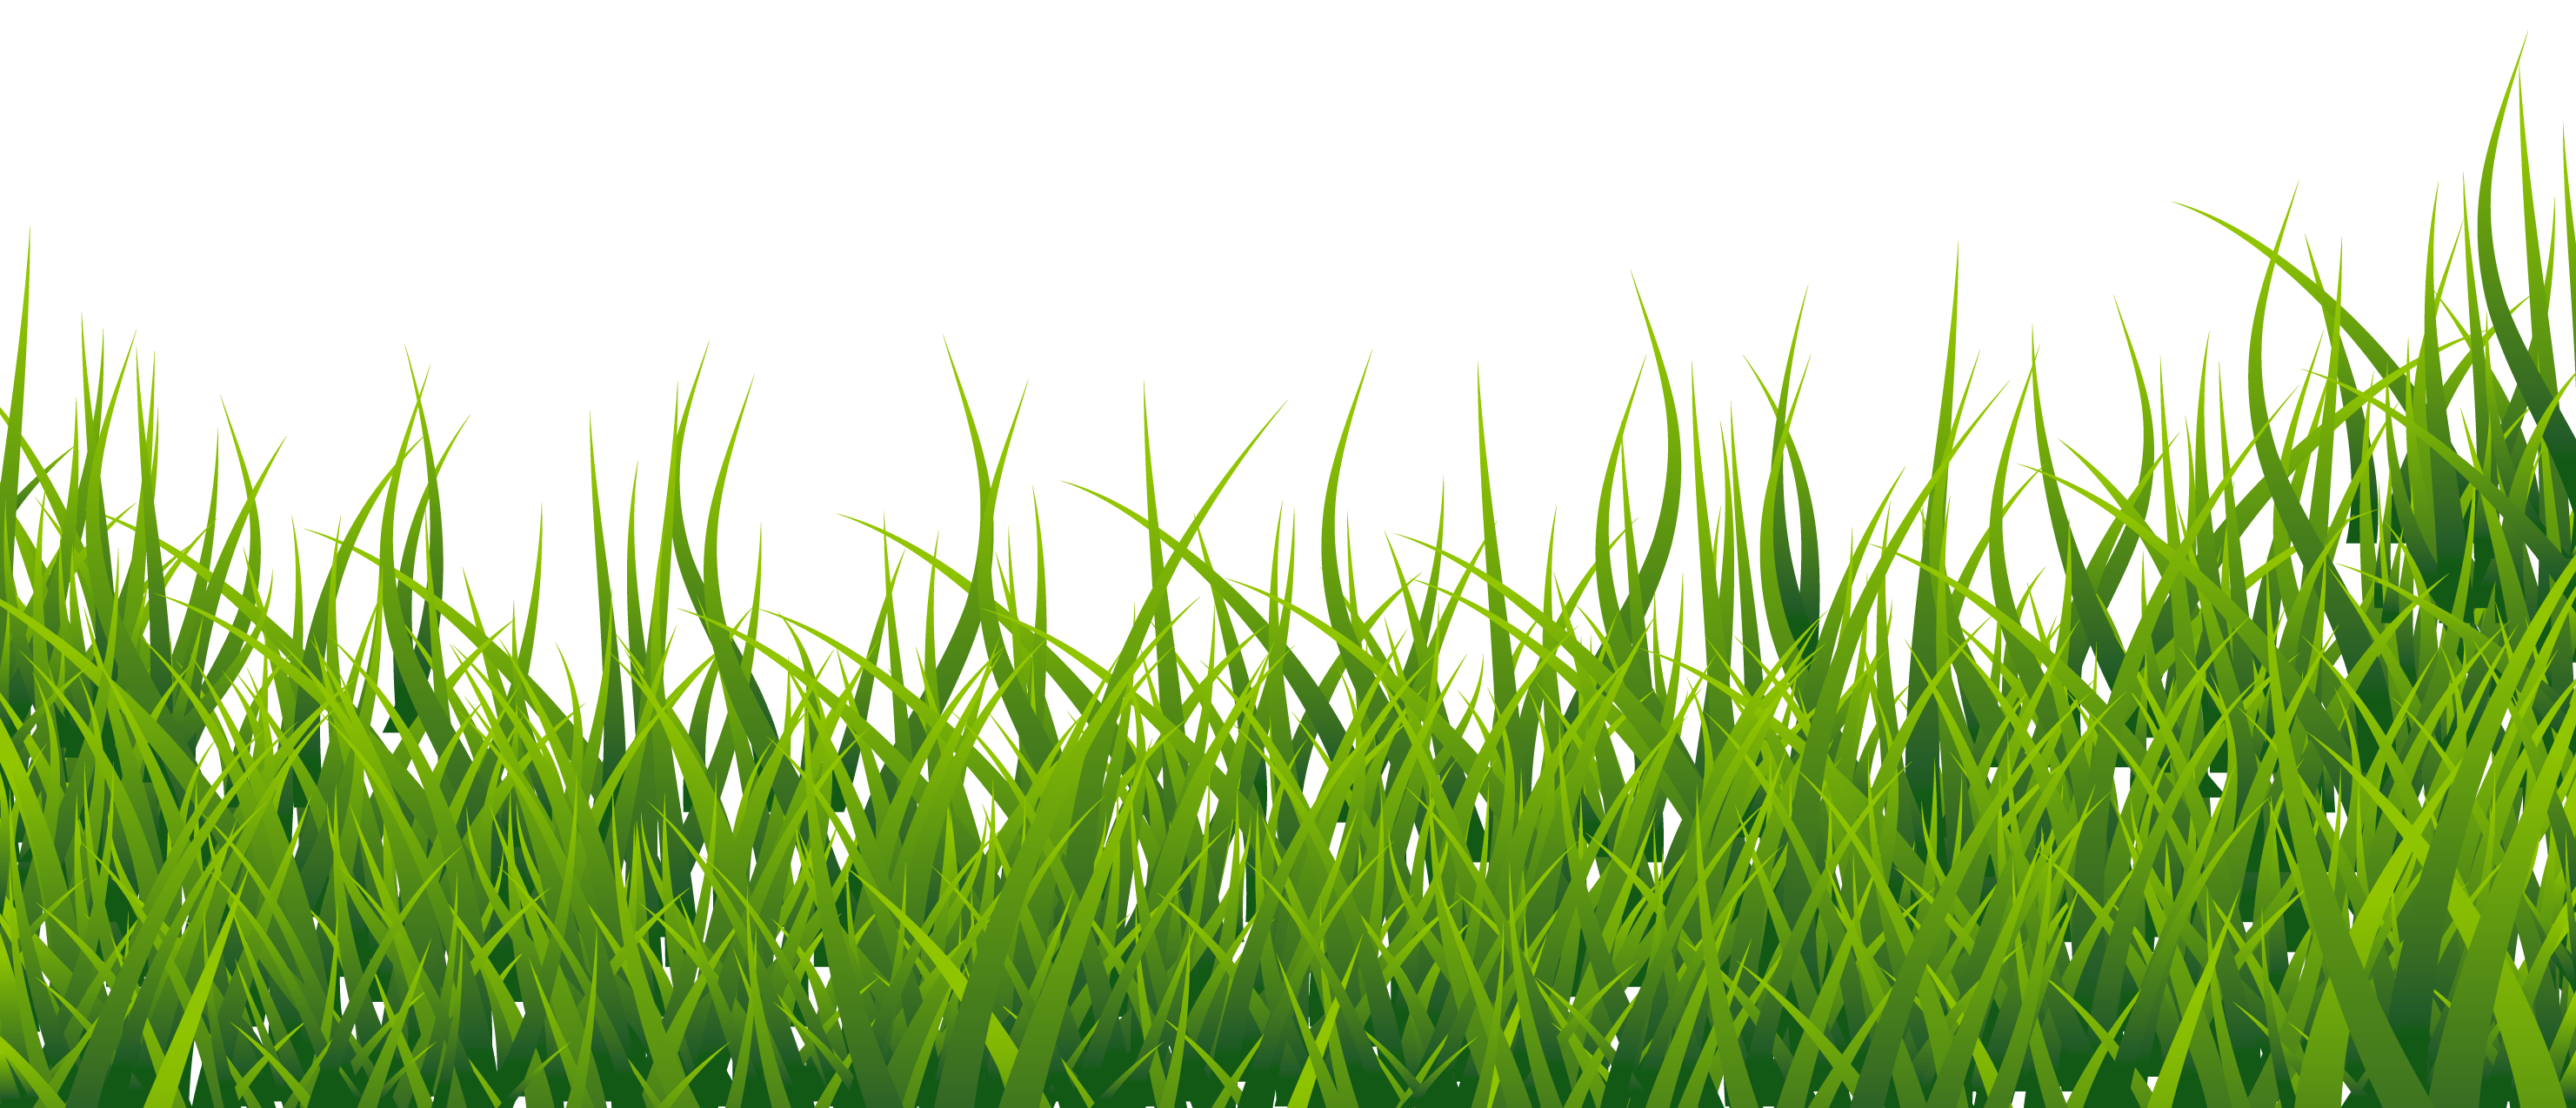 Facebook clipart thumbnail. Clip art grass picture